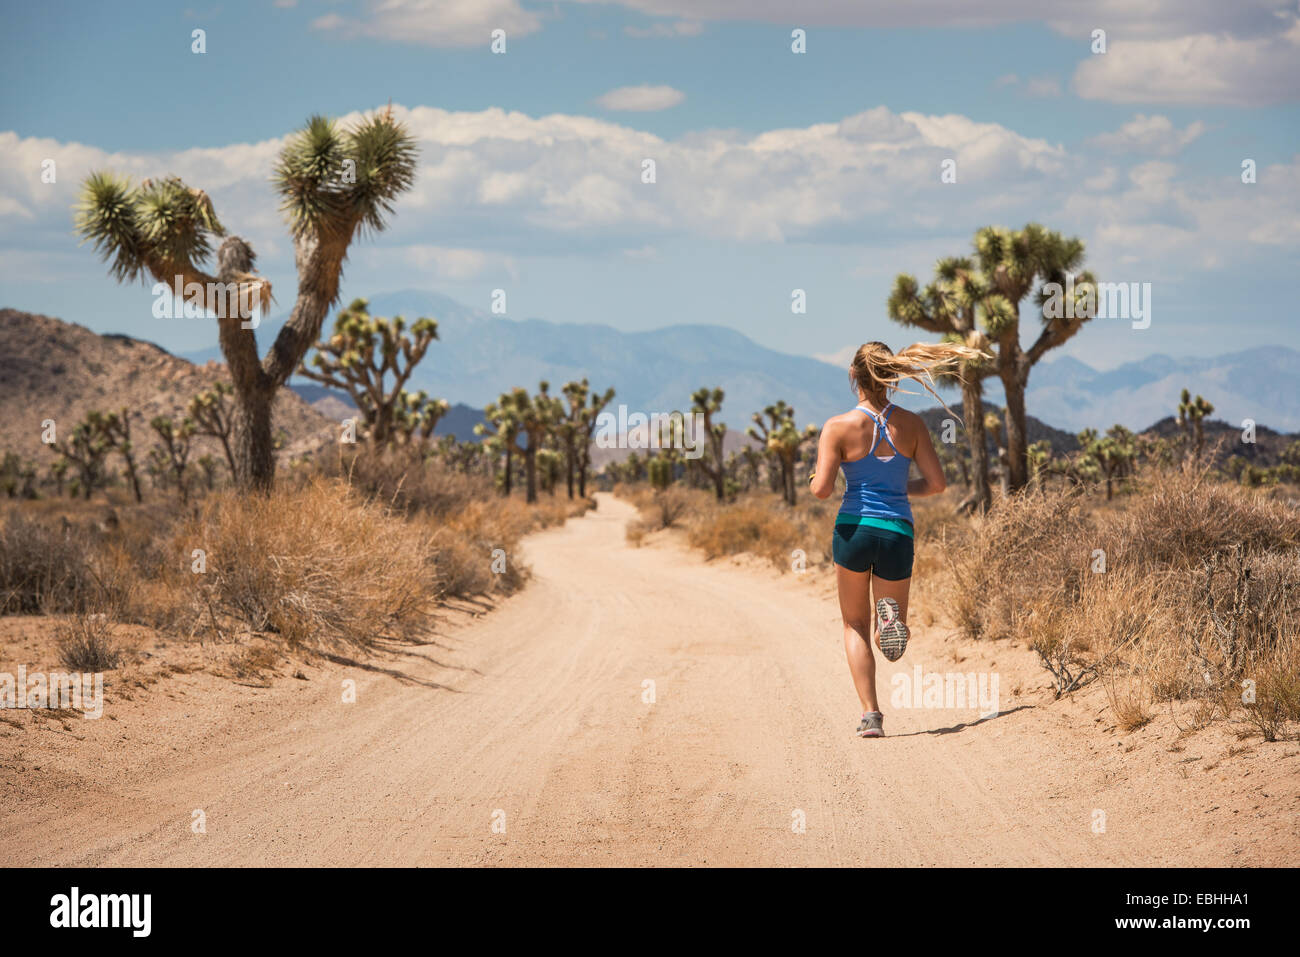 Frau rennt, Joshua Tree Nationalpark, Kalifornien, USA Stockbild